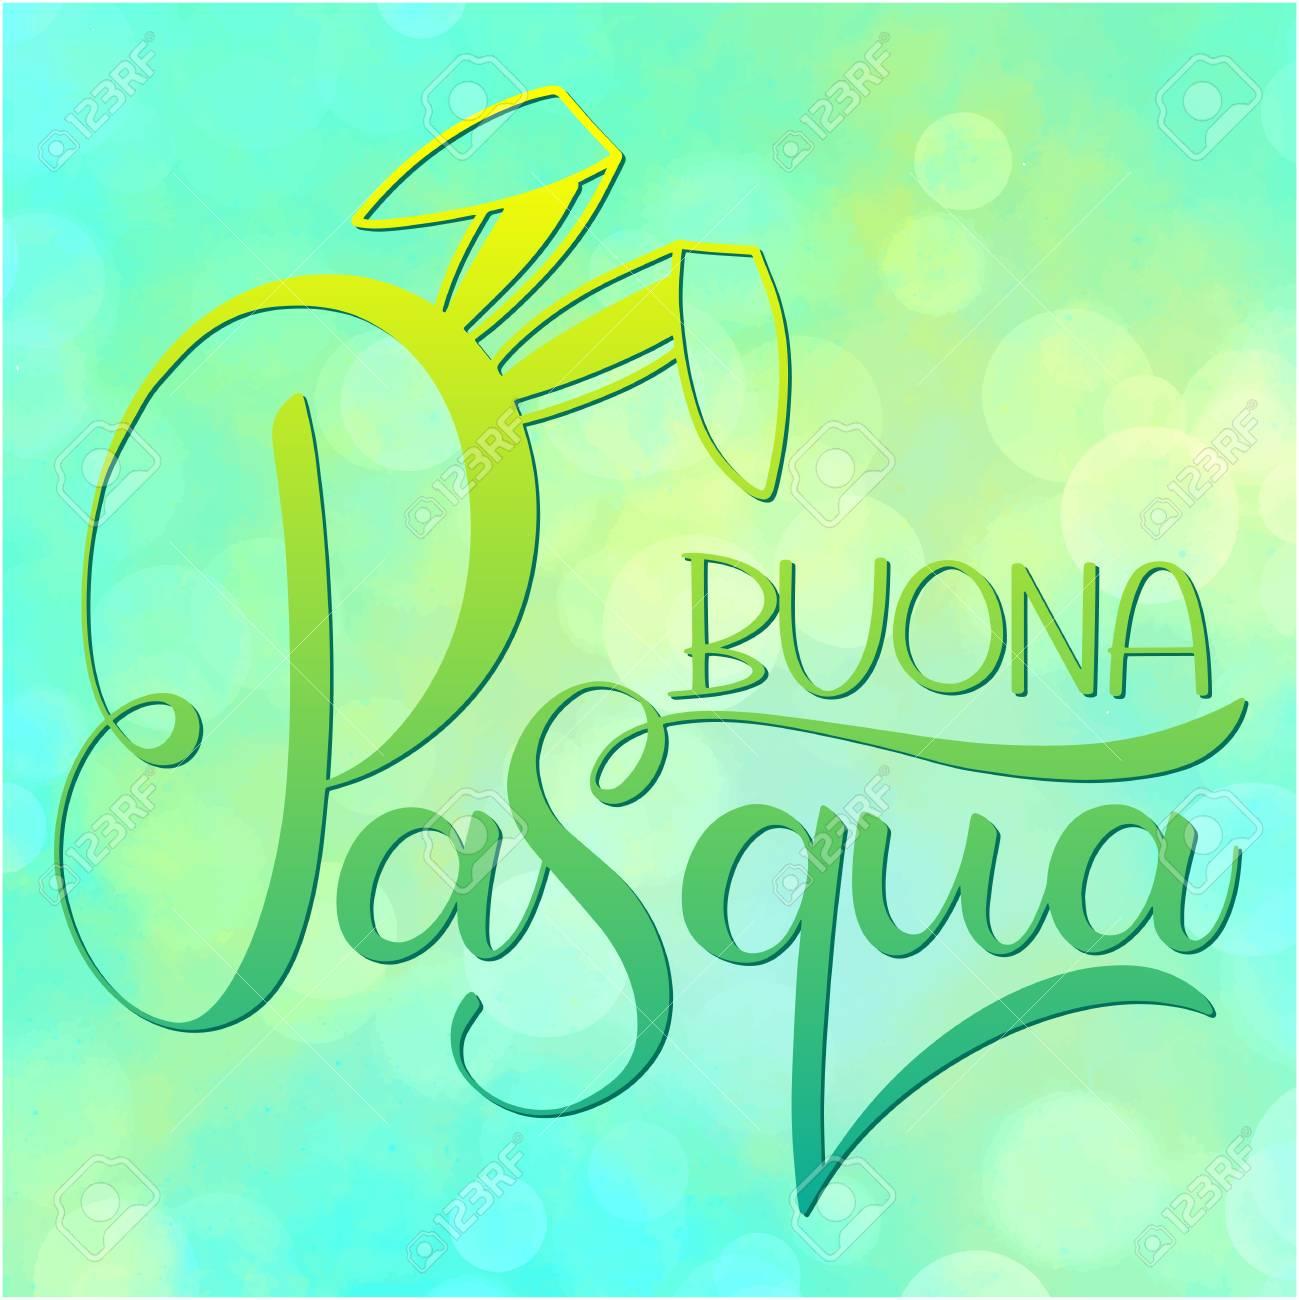 Buona Pasqua Colorful Lettering Happy Easter Colorful Lettering